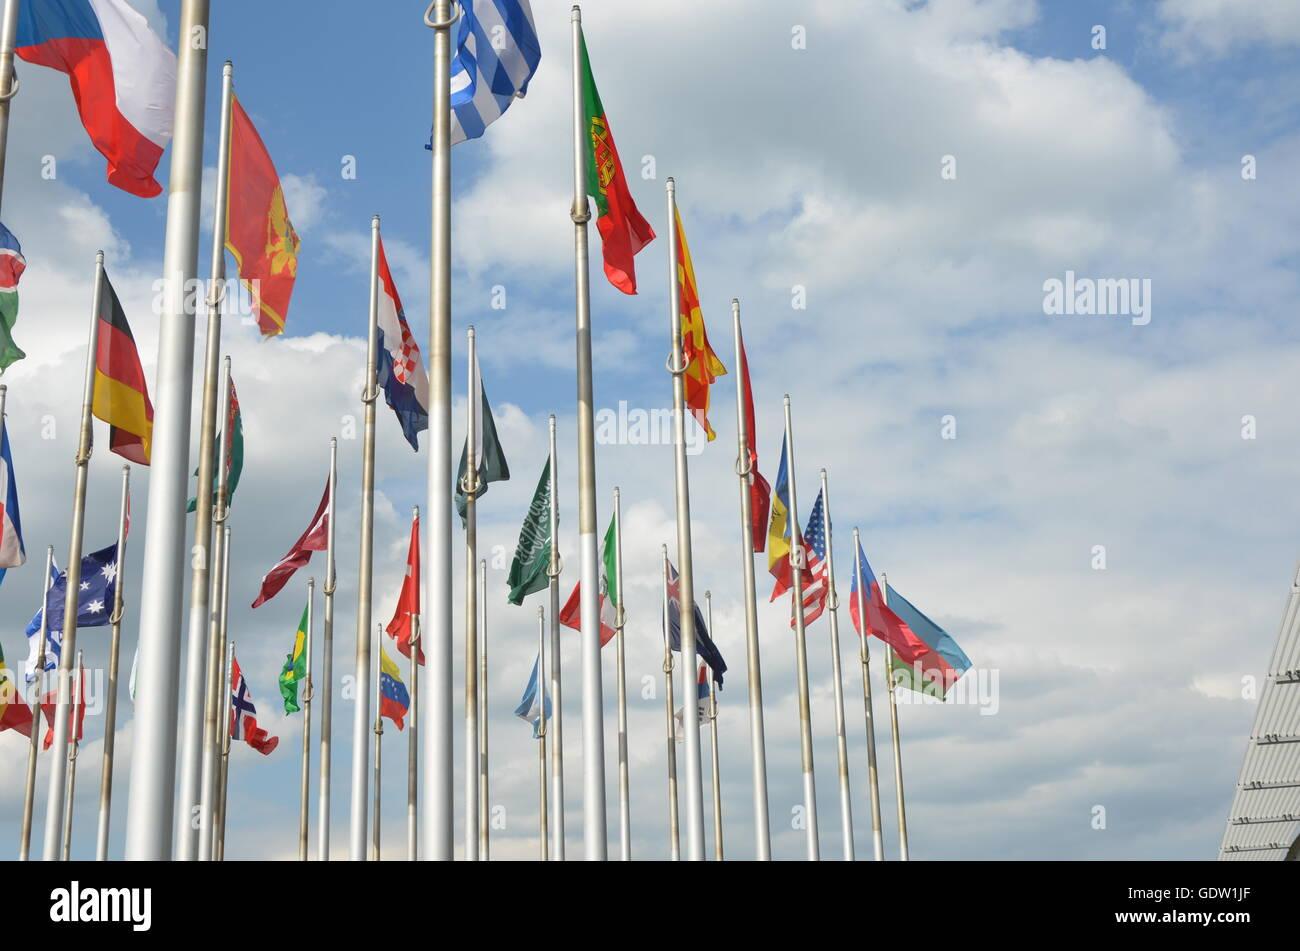 flags, international, world, sky, citizenship, nobody, many, national, blow, diplomacy, cooperative, symbol, cooperation - Stock Image